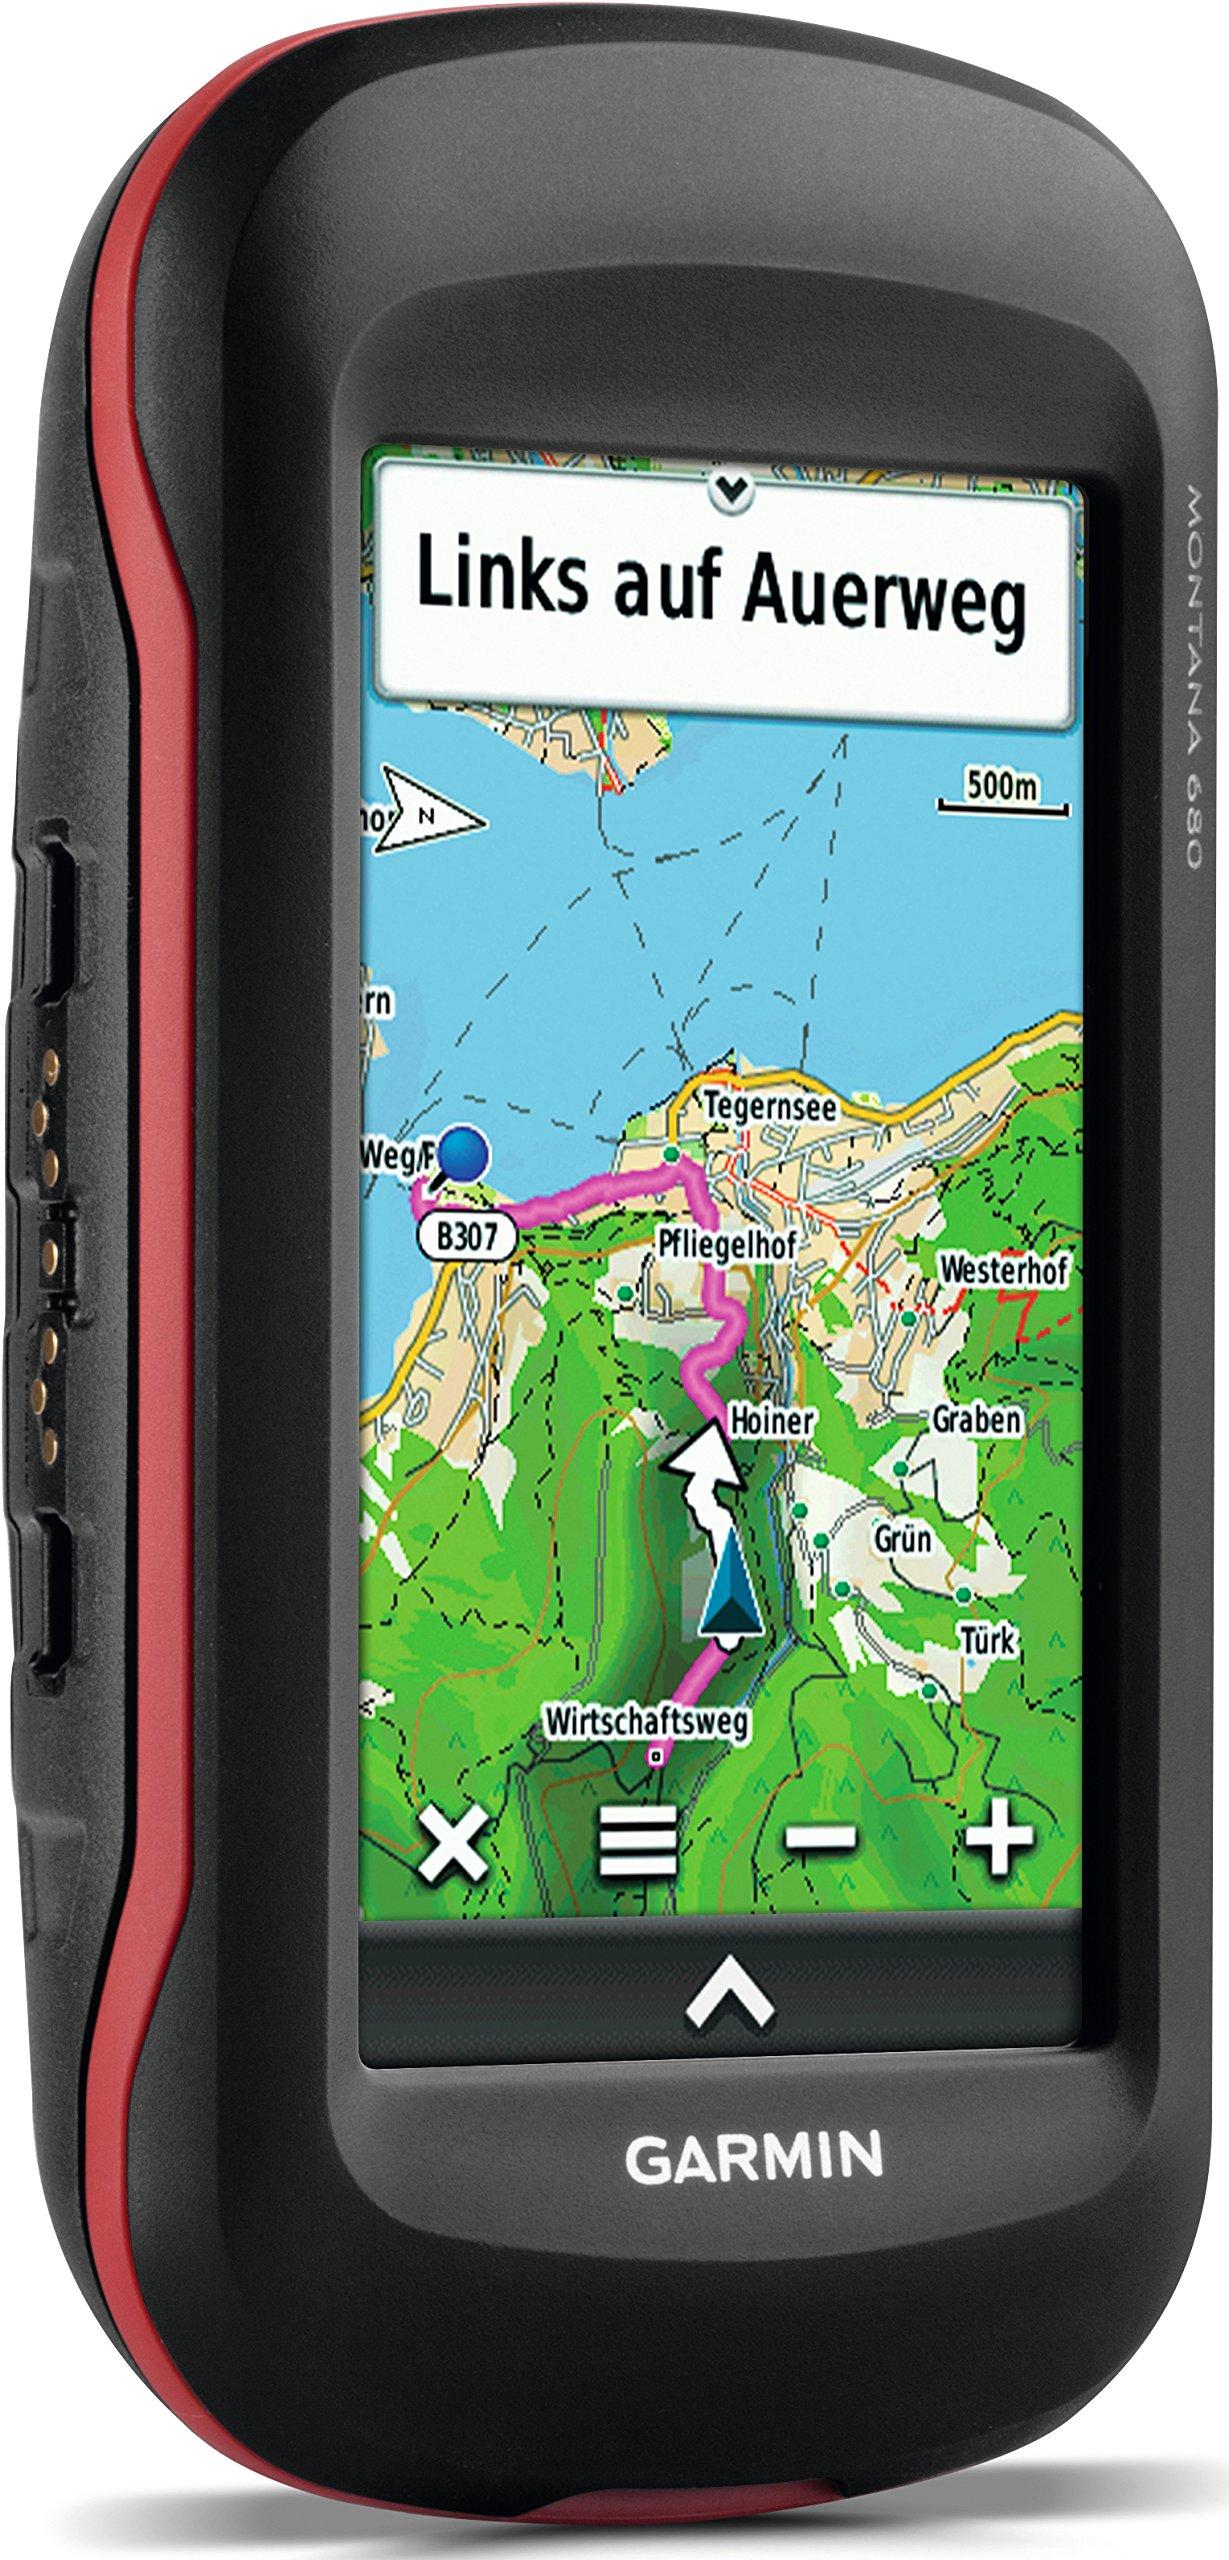 Garmin Montana 680 Touchscreen GPS/GLONASS Receiver, Worldwide Basemaps by Garmin (Image #2)